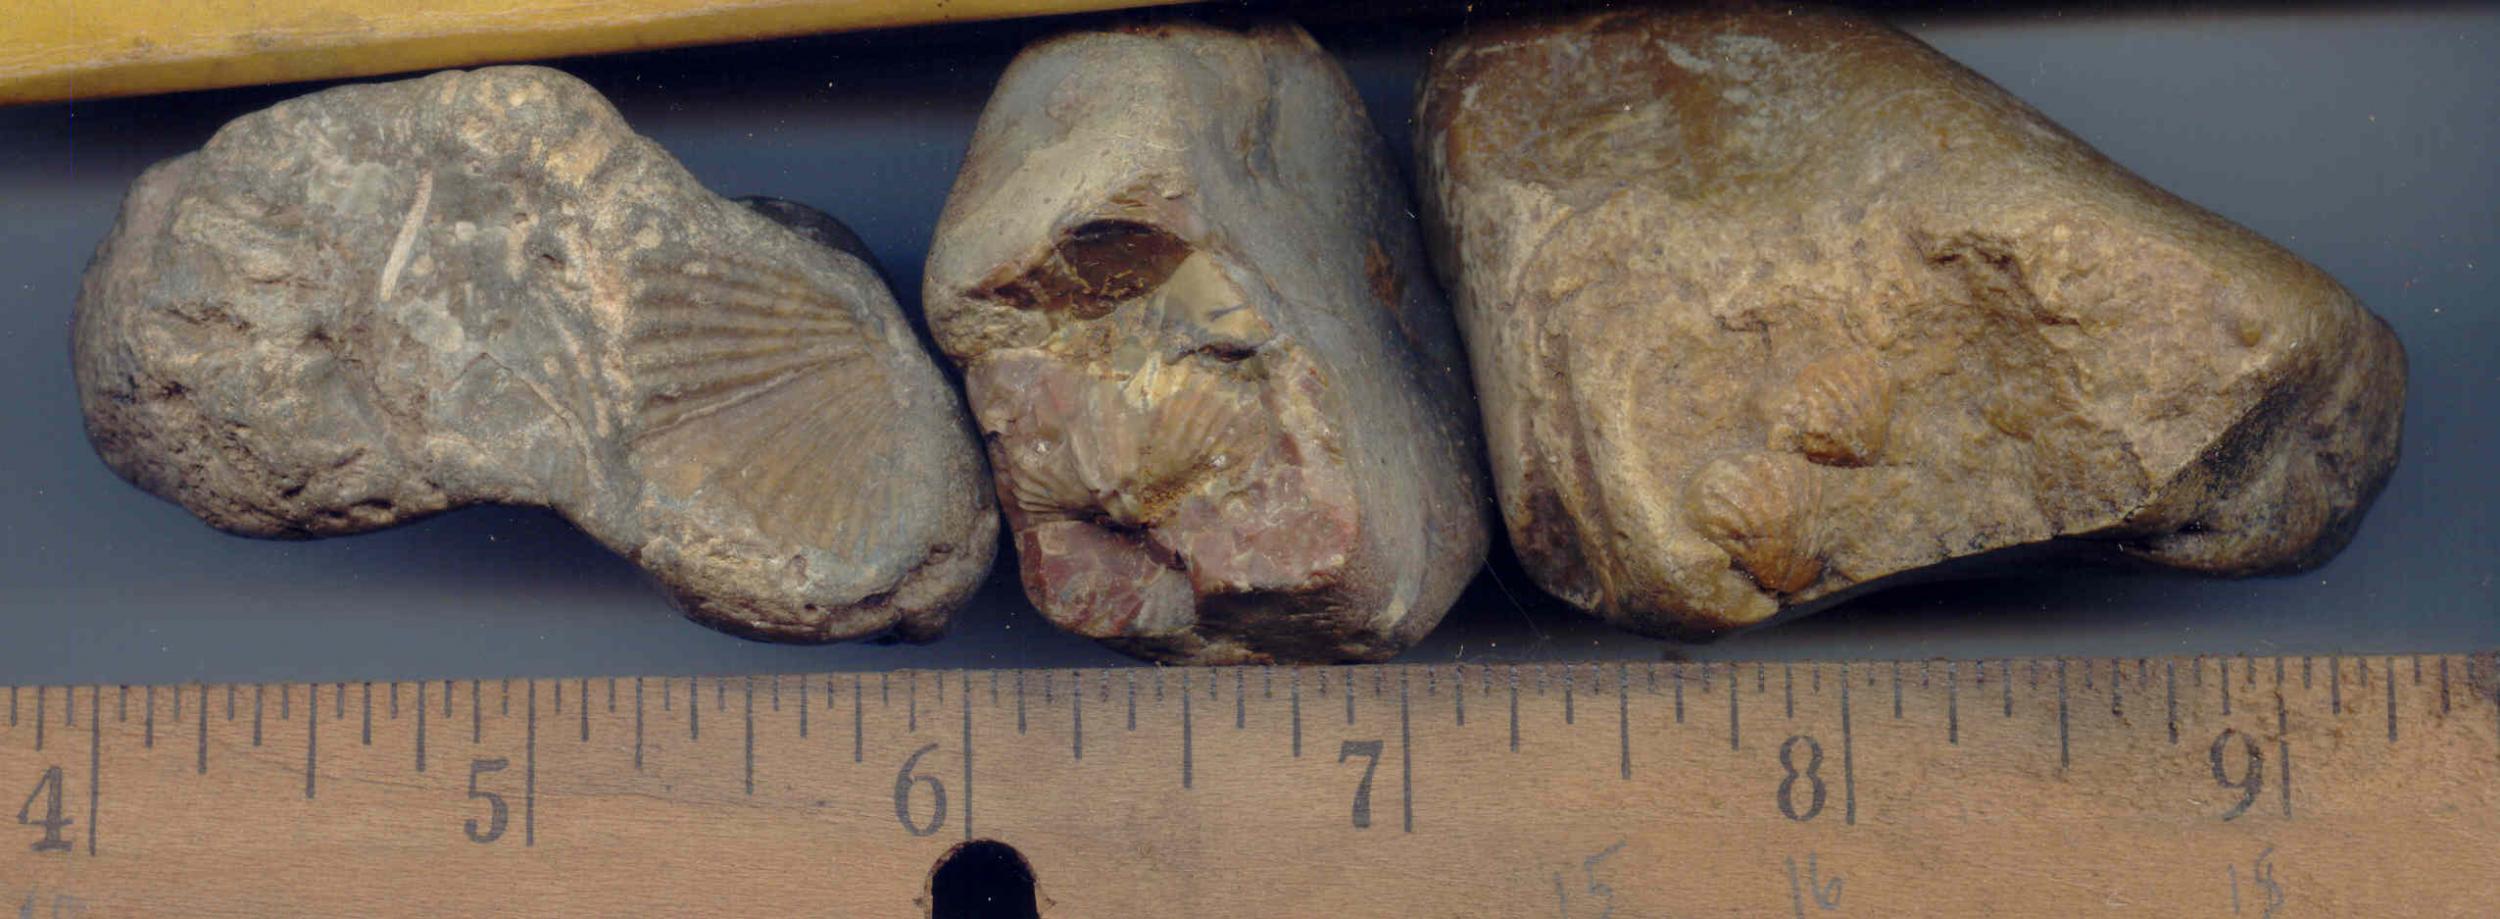 Fossils Identifying Fossils